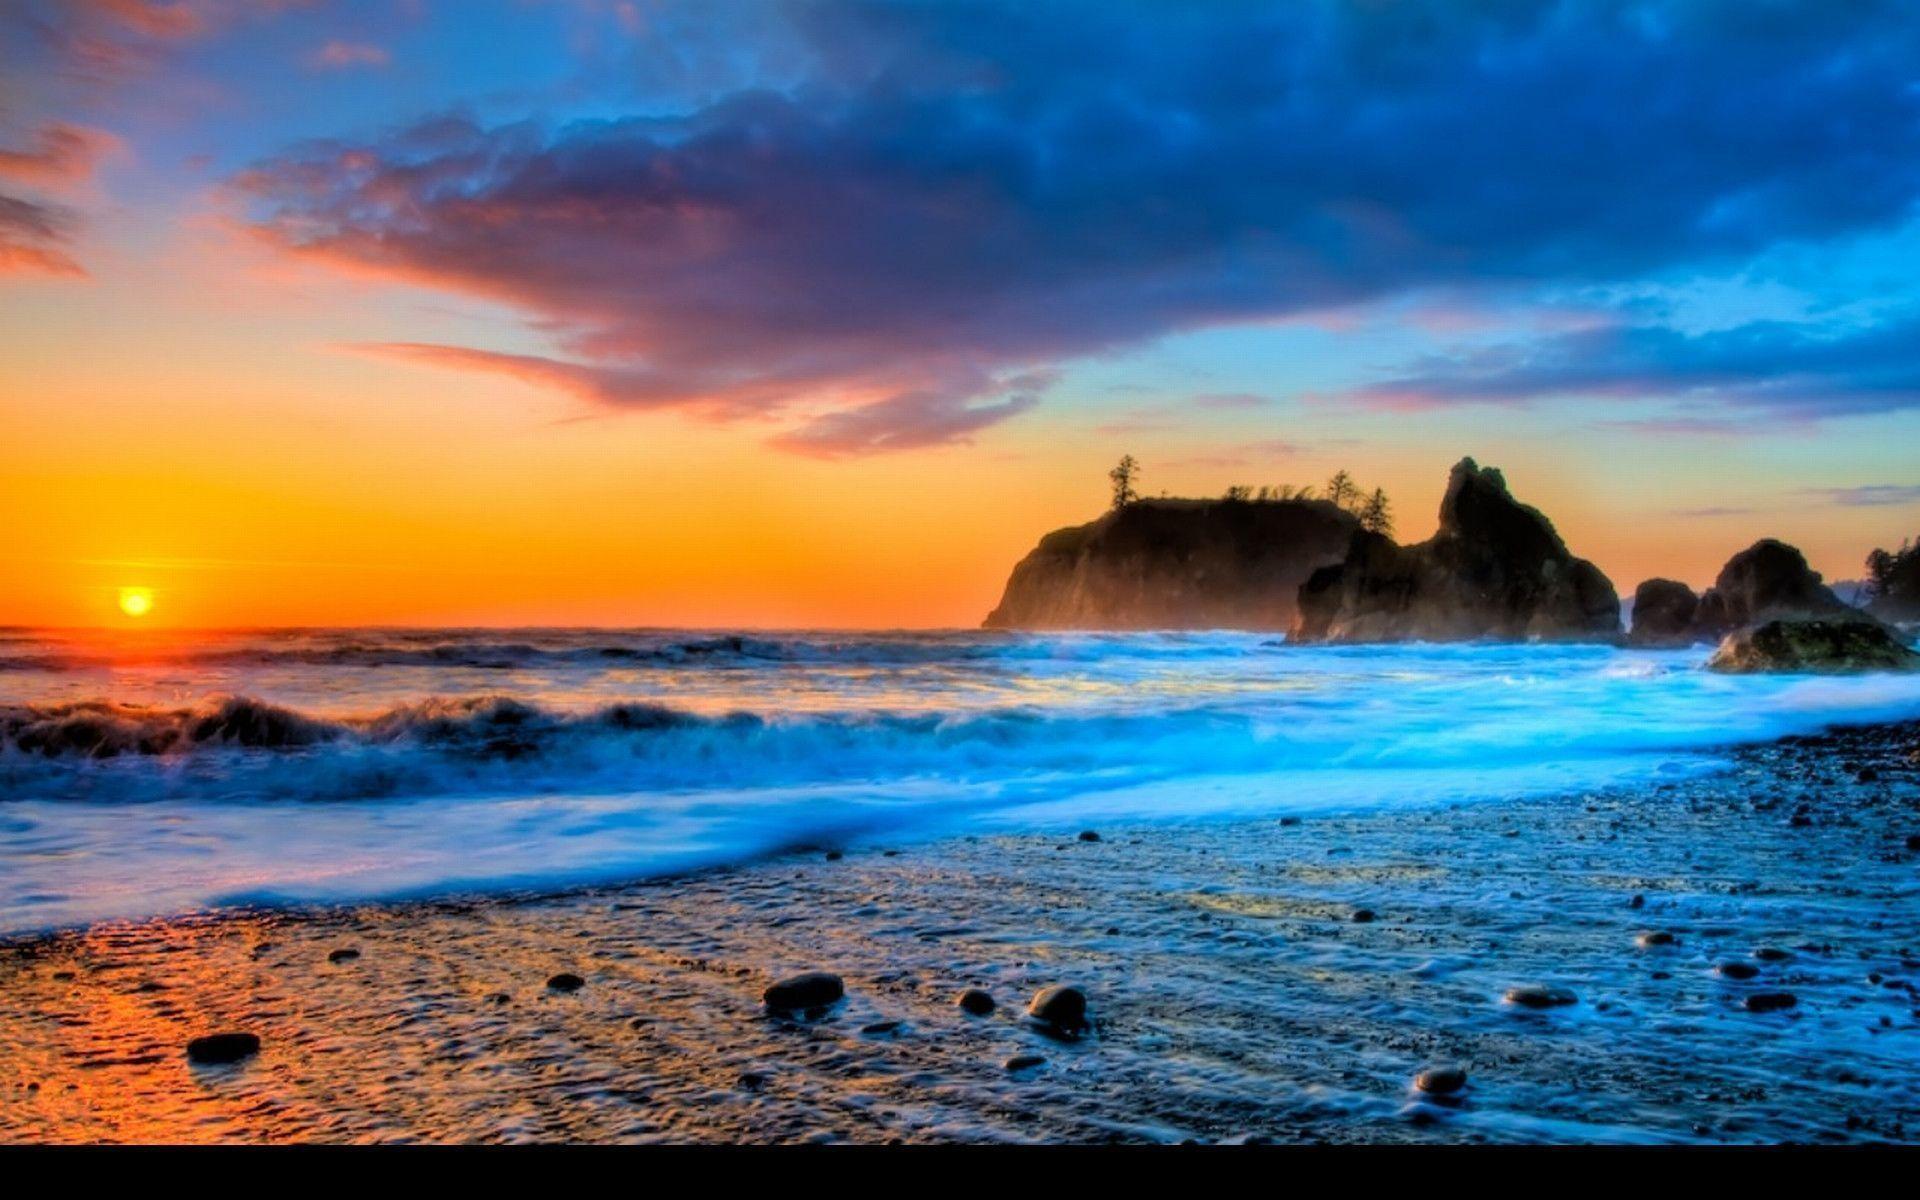 Beach Sunset Pics